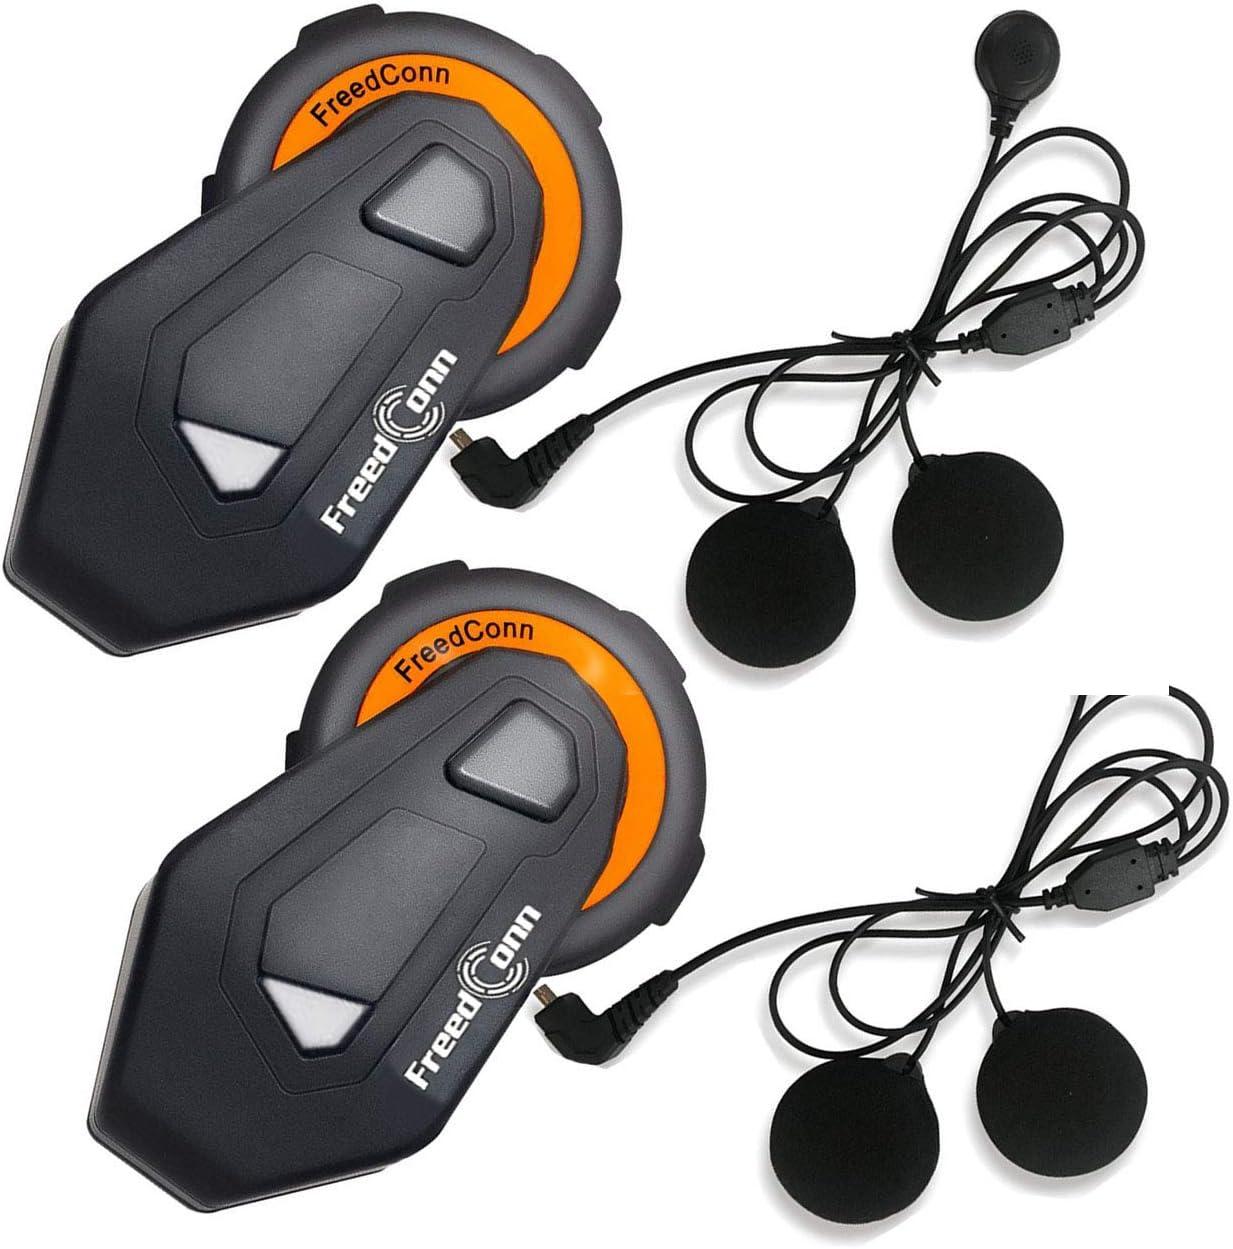 Voice Prompt GPS Motorcycle Helmet Intercom Communication Systems Bluetooth 4.1 Headsets 1 Pack IPX65 Waterproof Full Duplex 6 Riders Group Helmet Intercom Stereo Music FM Radio Range 1000m